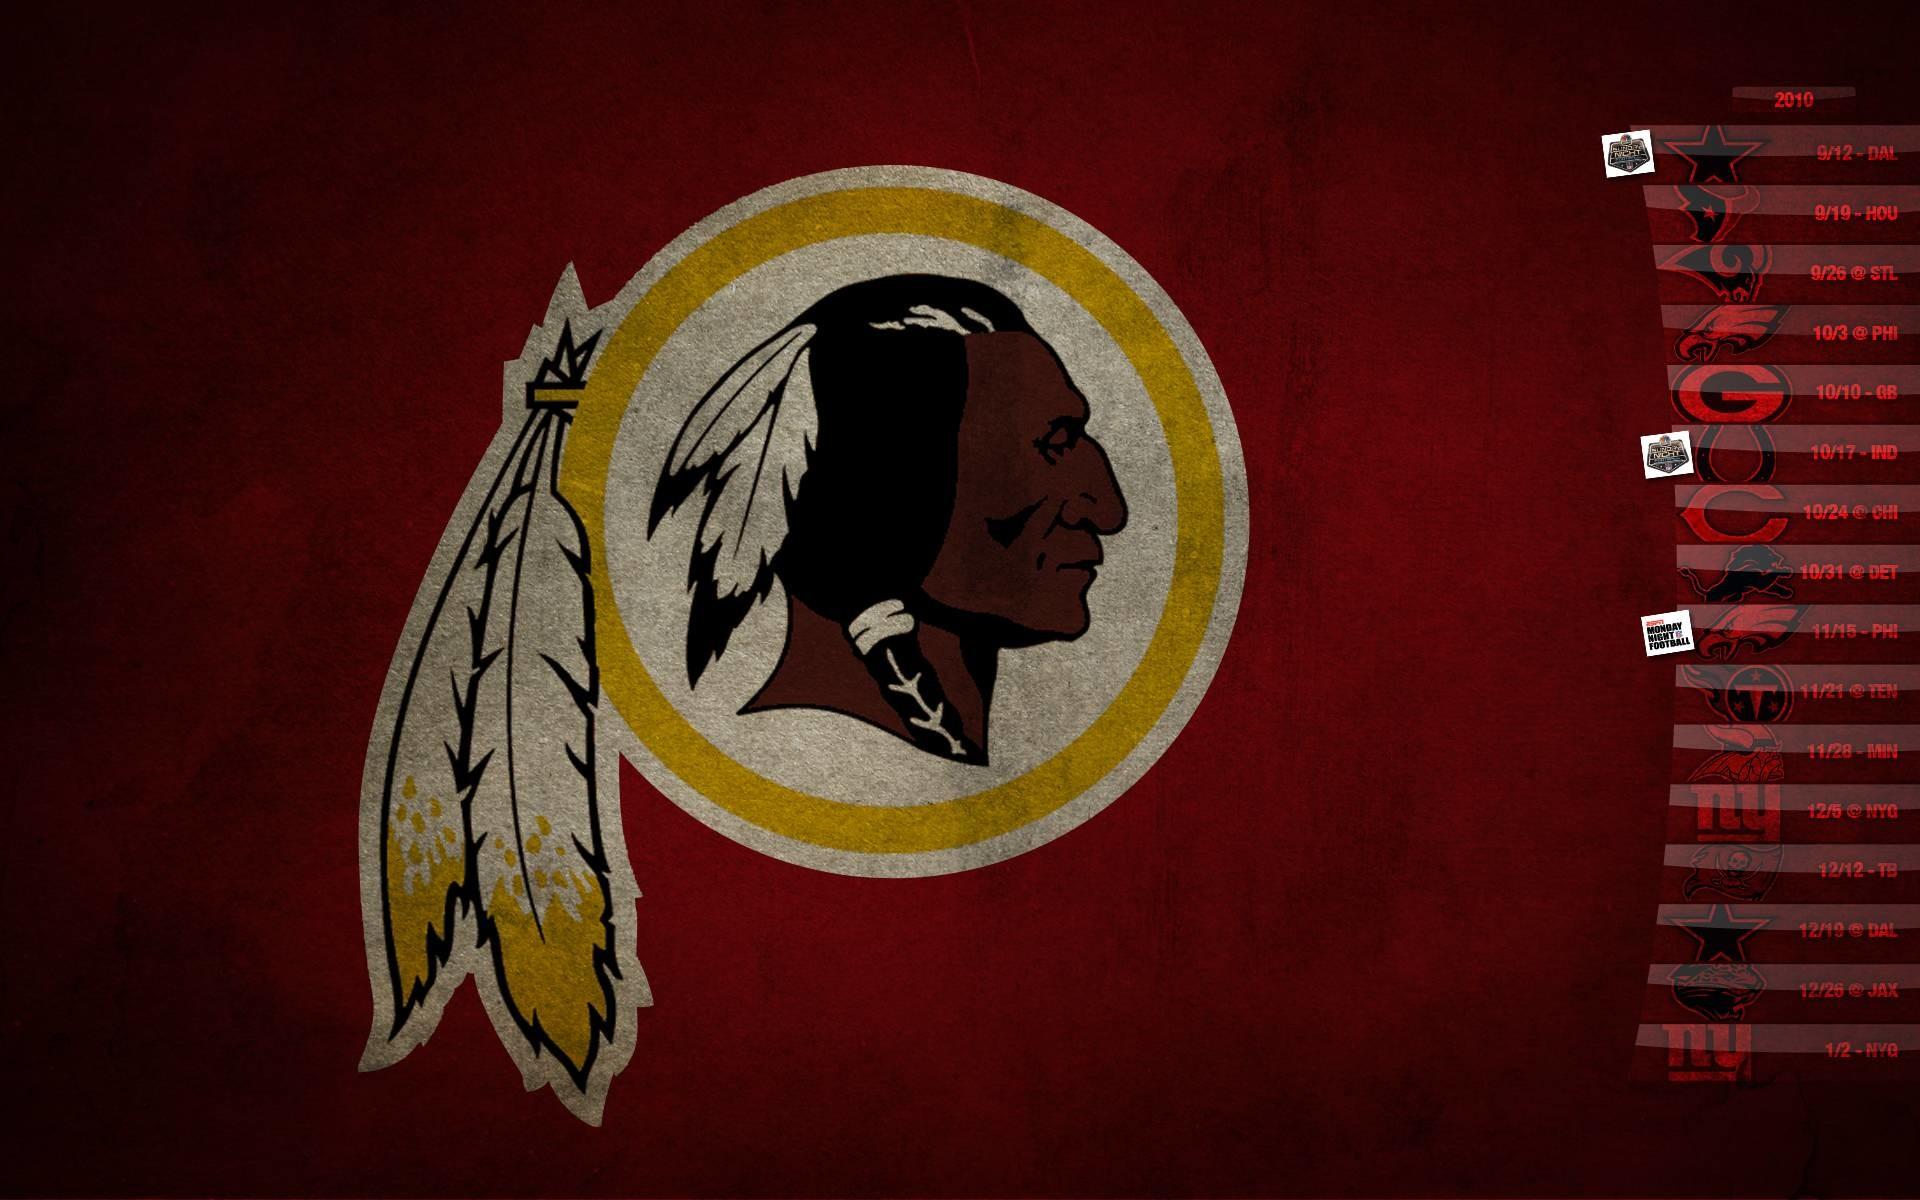 Washington Redskins Live Wallpaper